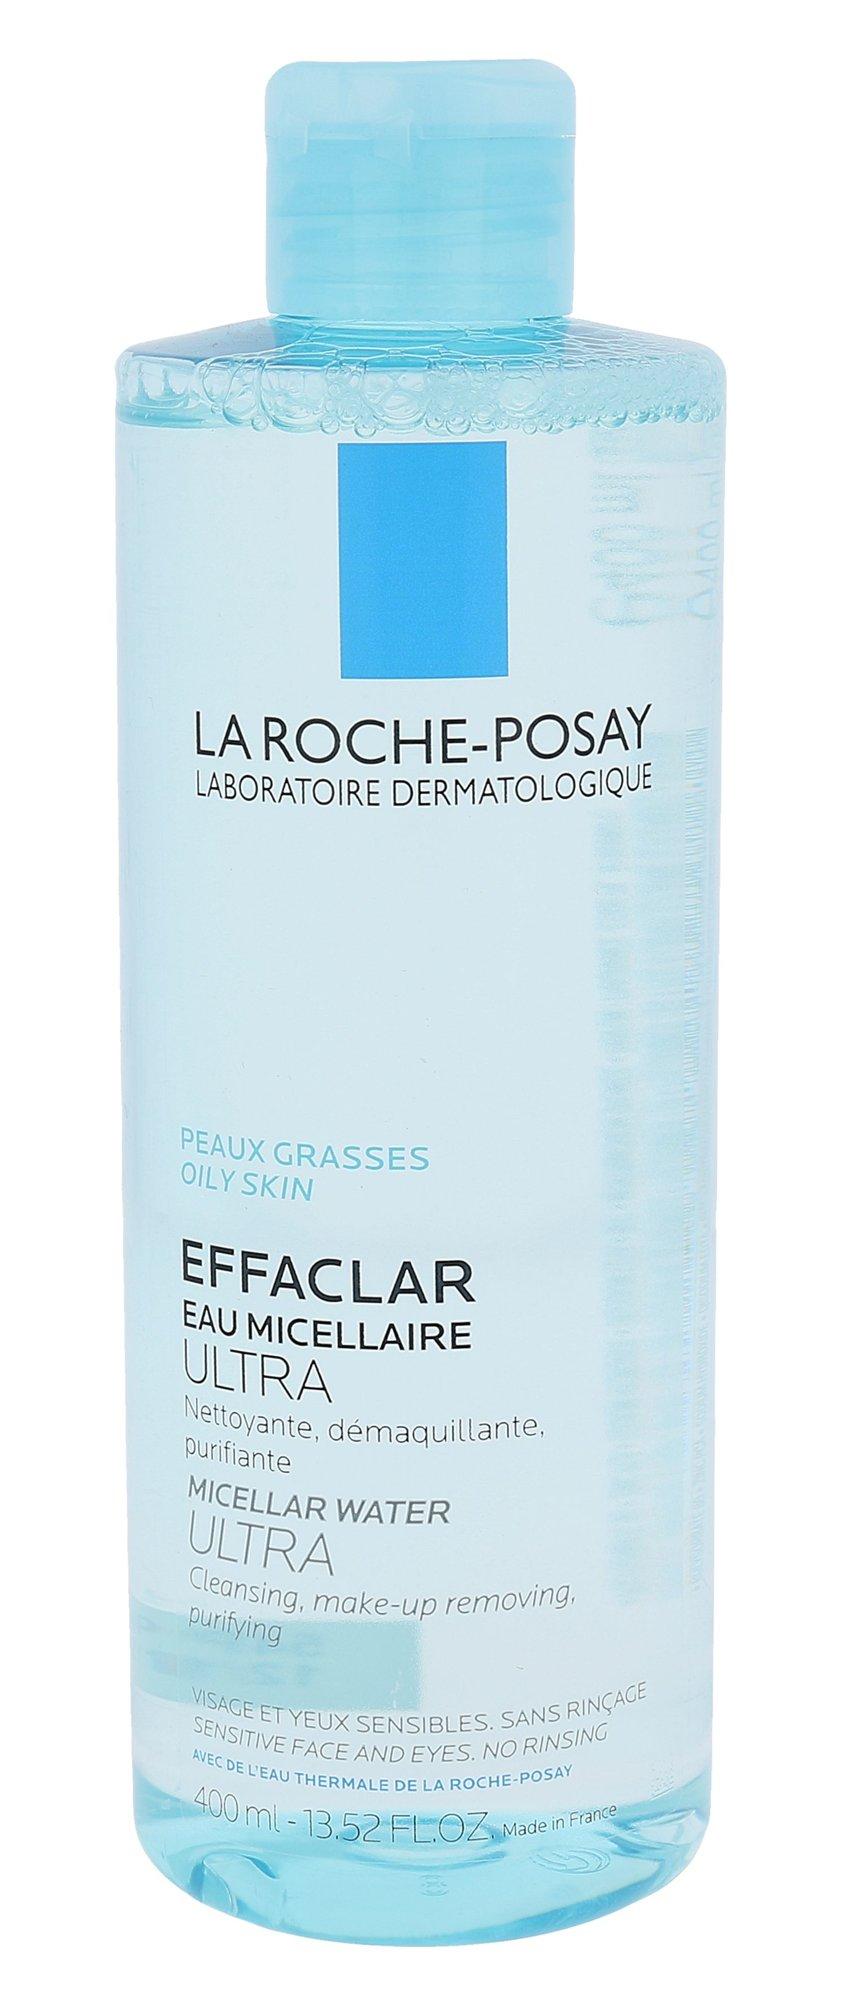 La Roche-Posay Effaclar Cosmetic 400ml